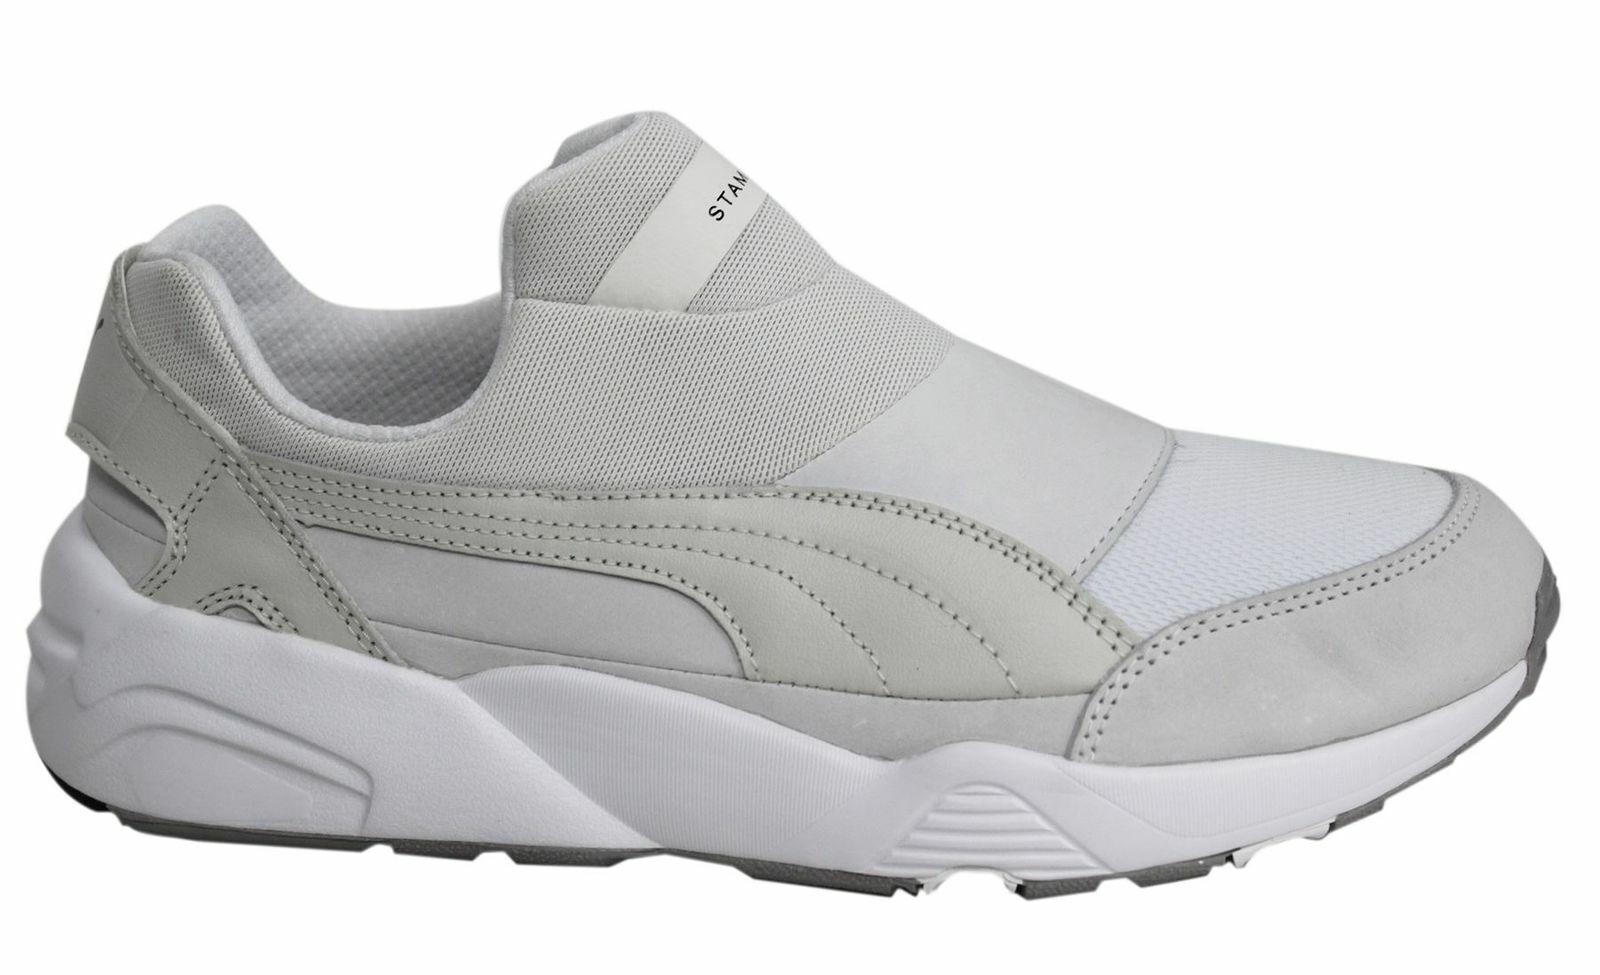 Herrenschuhe Puma Trinomic Sock X Stampd NM Mens Trainers